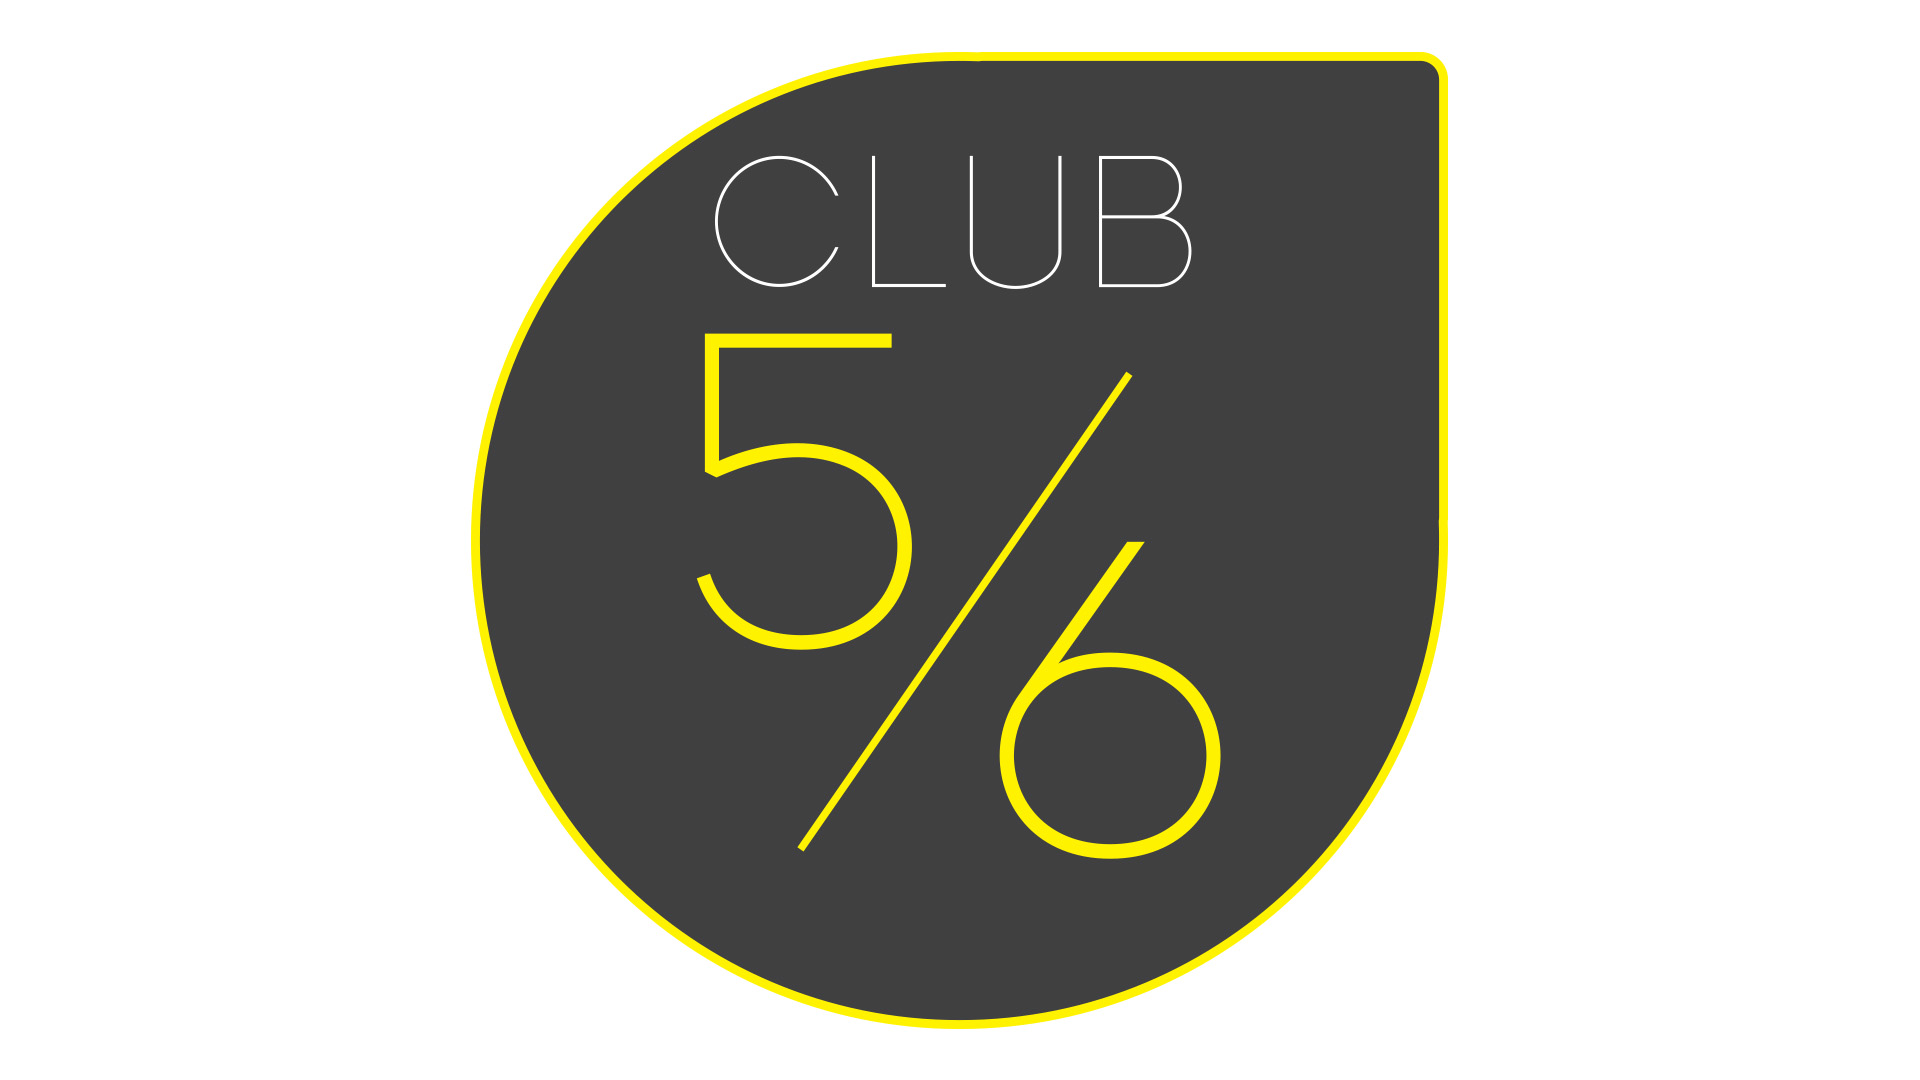 Club 5-6.jpg